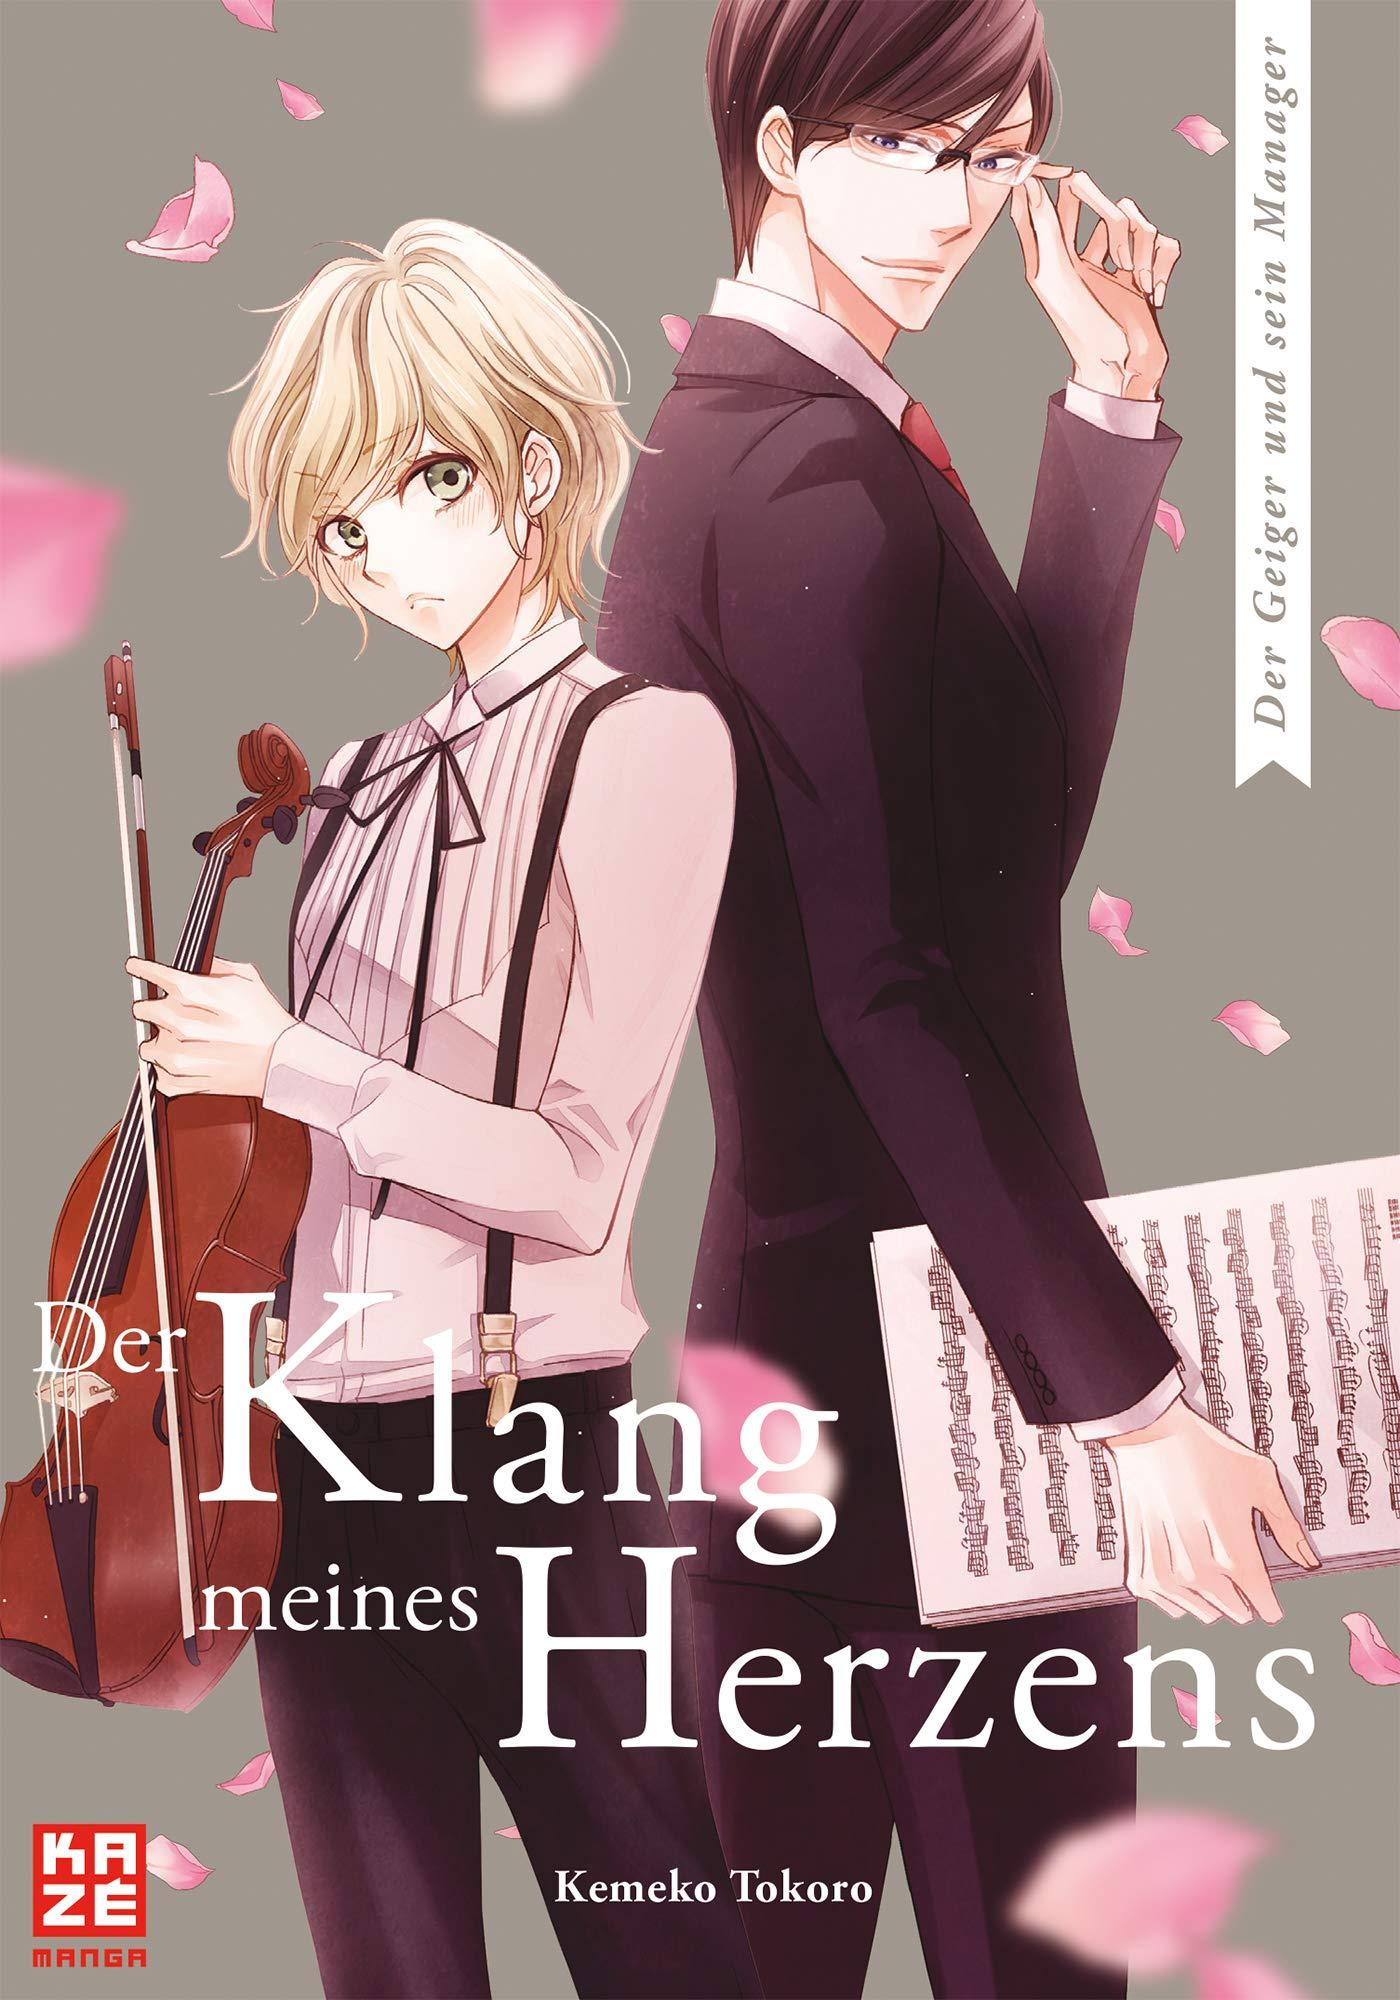 Der Klang meines Herzens 05 Taschenbuch – 6. Dezember 2018 Kemeko Tokoro Etsuko Tabuchi Florian Weitschies KAZÉ Manga